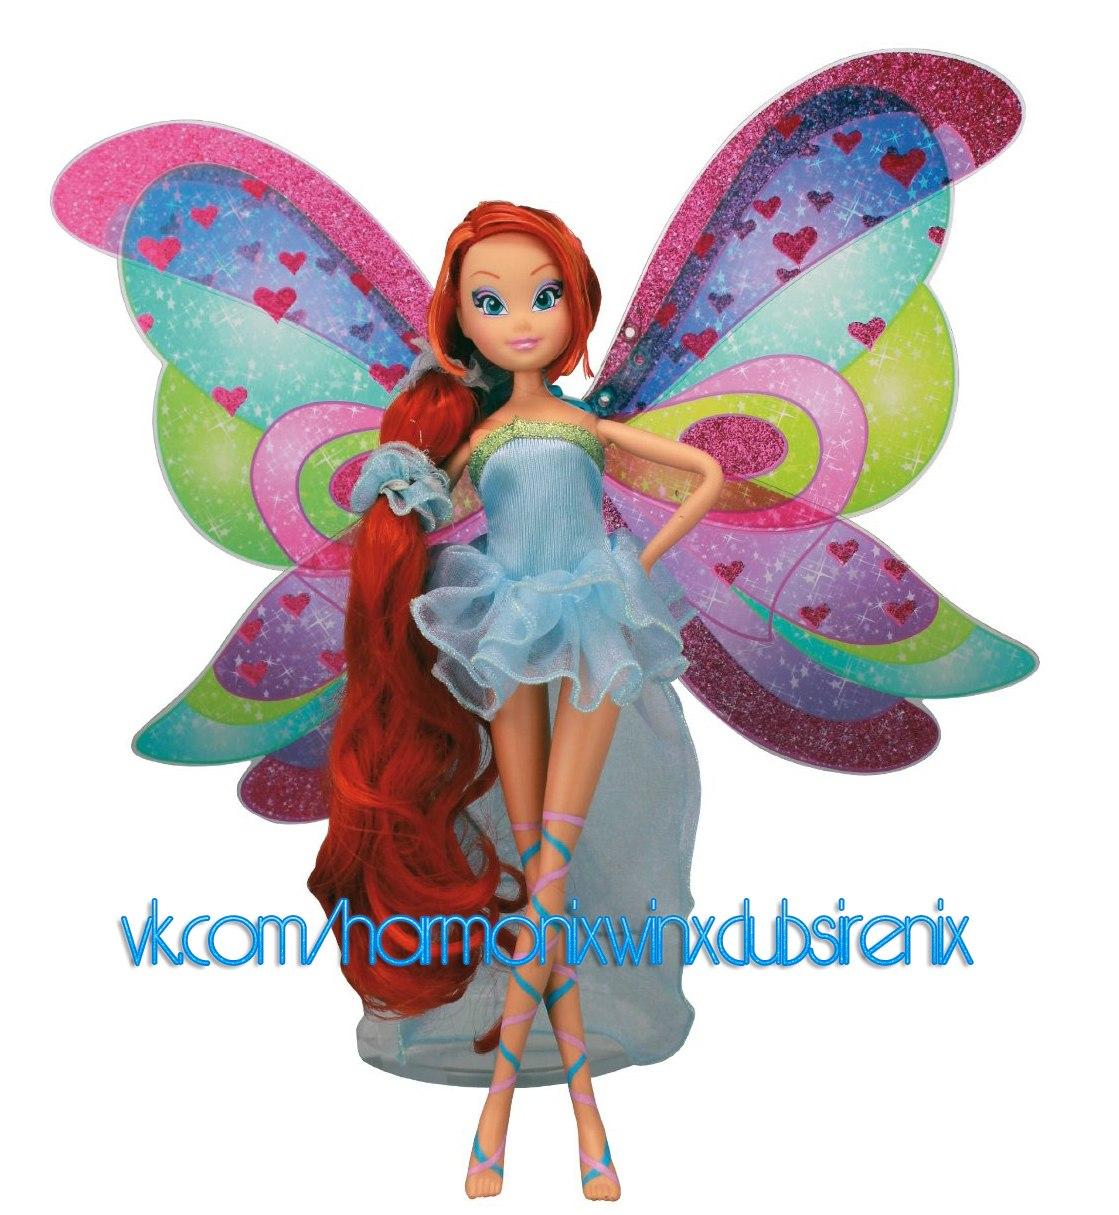 Bloom Sophix Doll is The Bloom Sirenix Doll